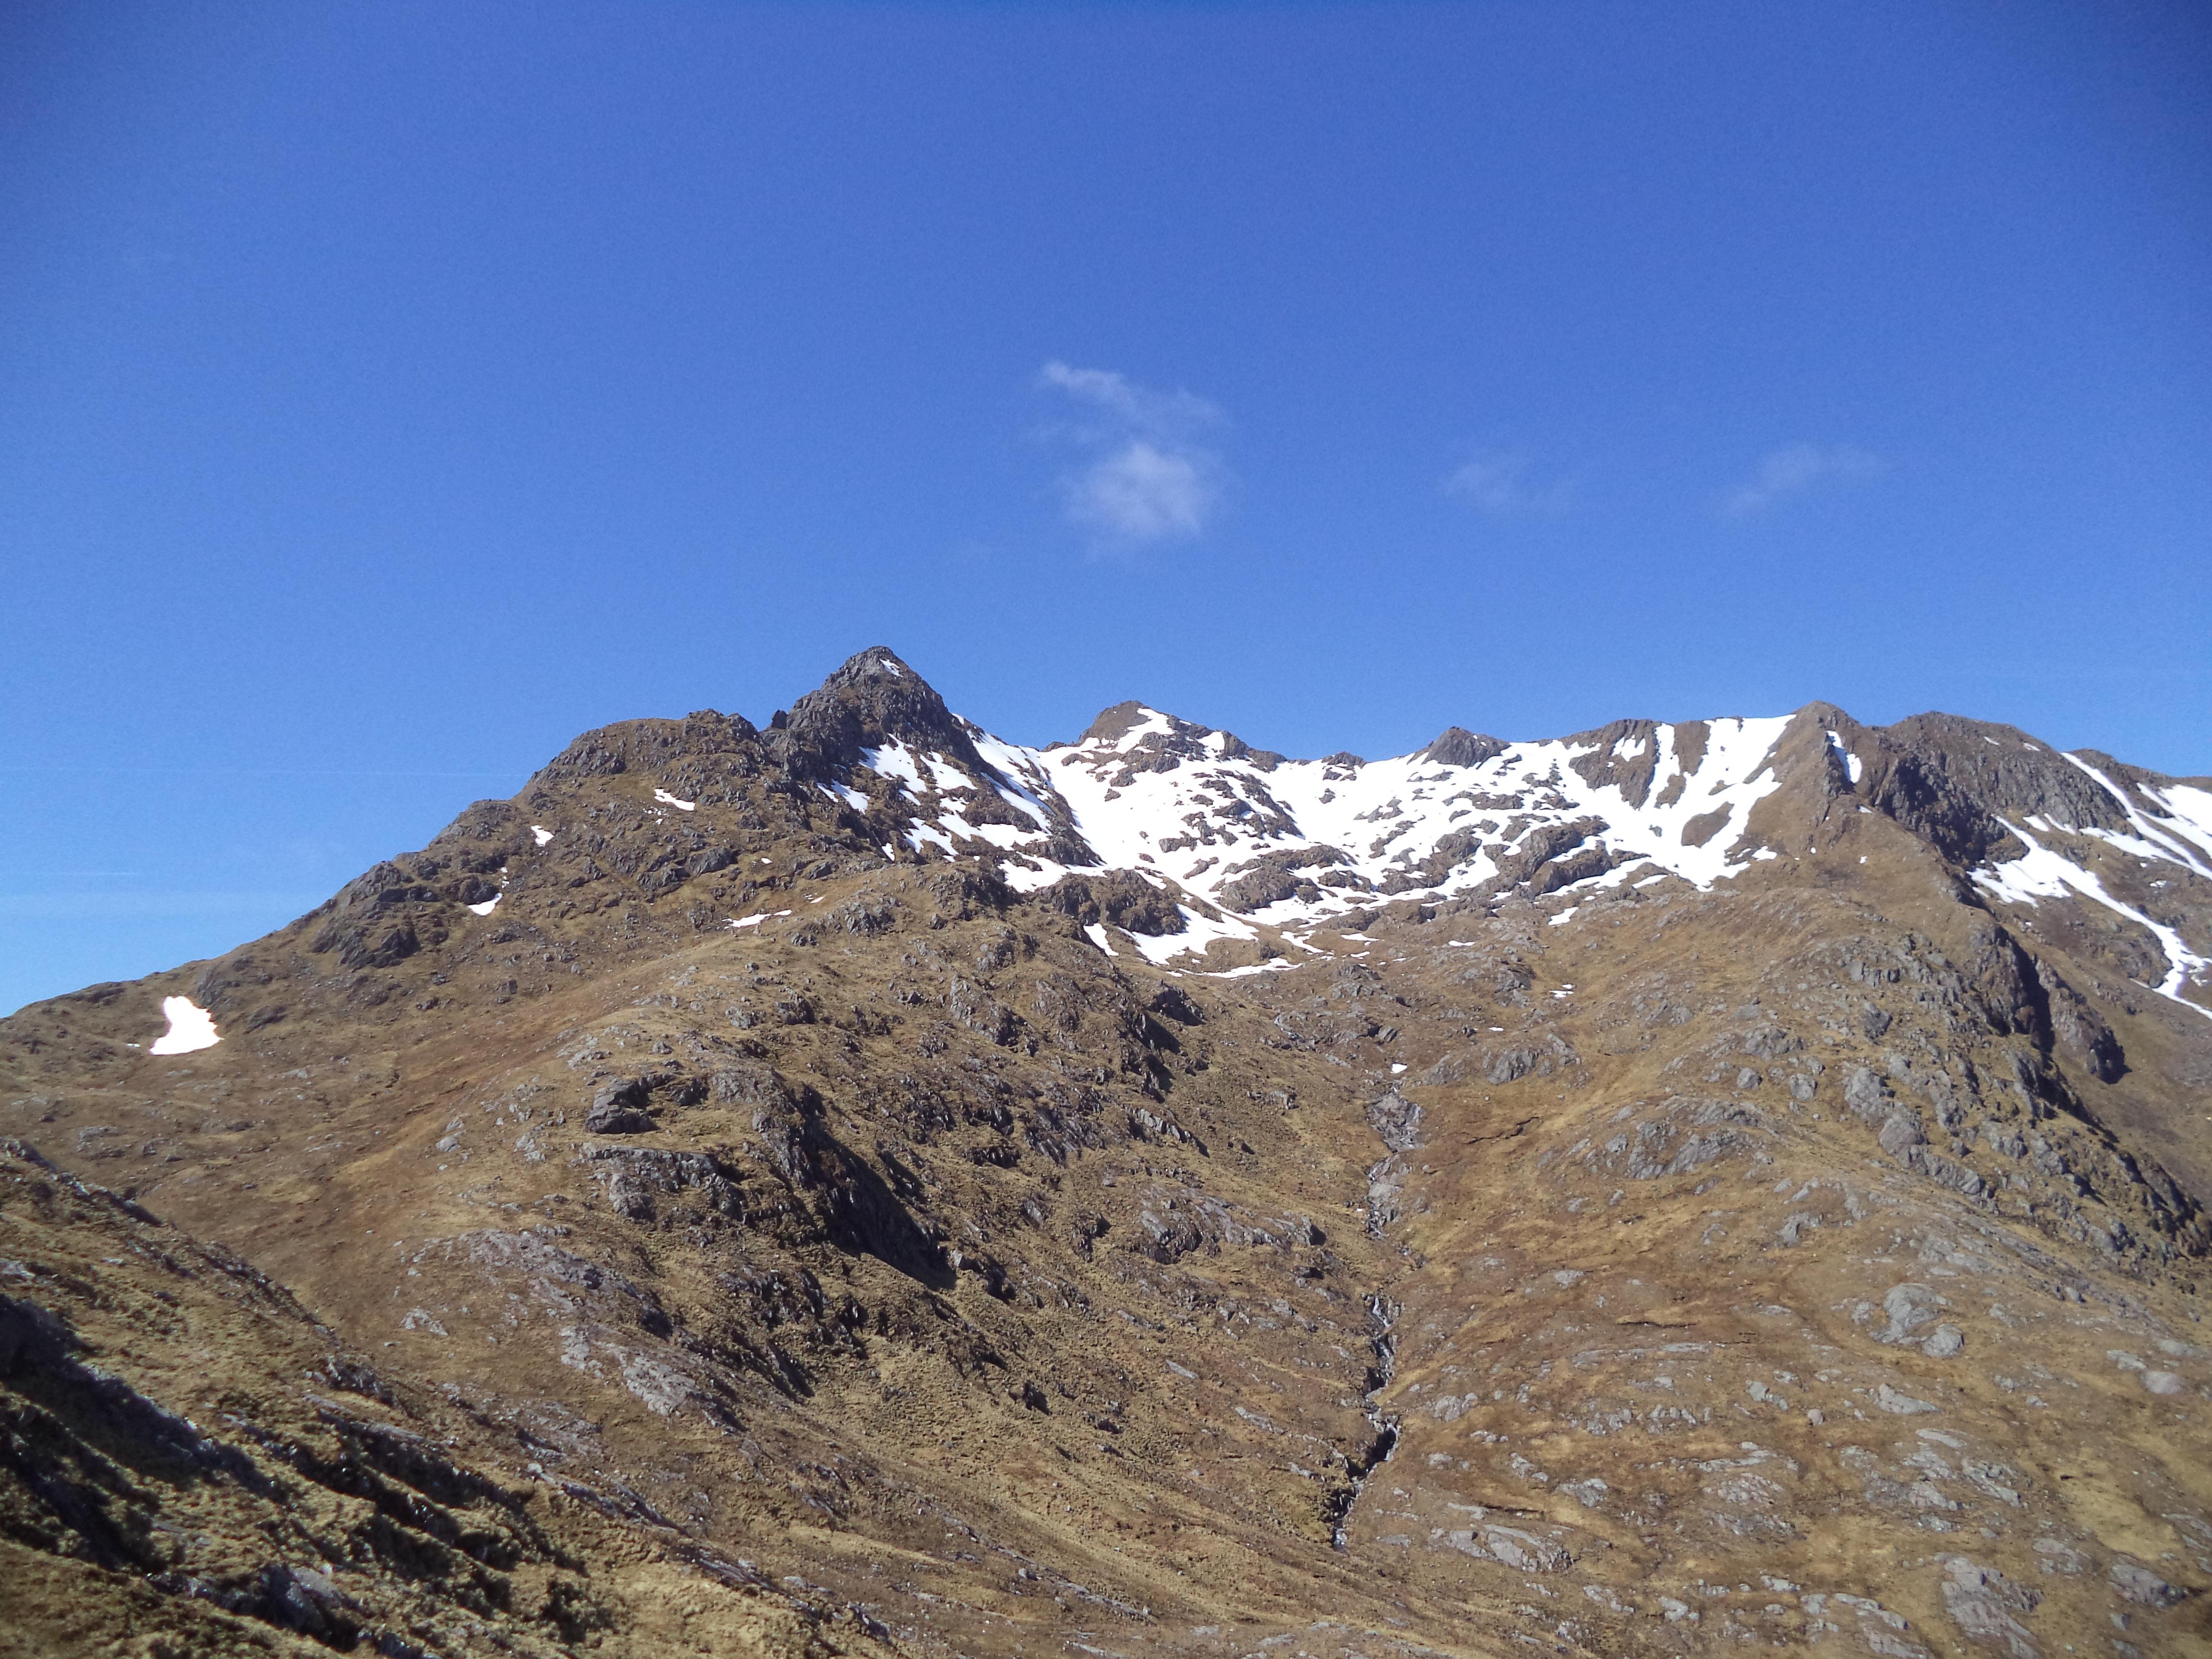 Rock Climbing Guide, Liathach Mountain Guide, Ben Nevis Mountain Guide, Glencoe Mountain Guide, Skye Mountain Guide, Cuillin Ridge Mountain Guide